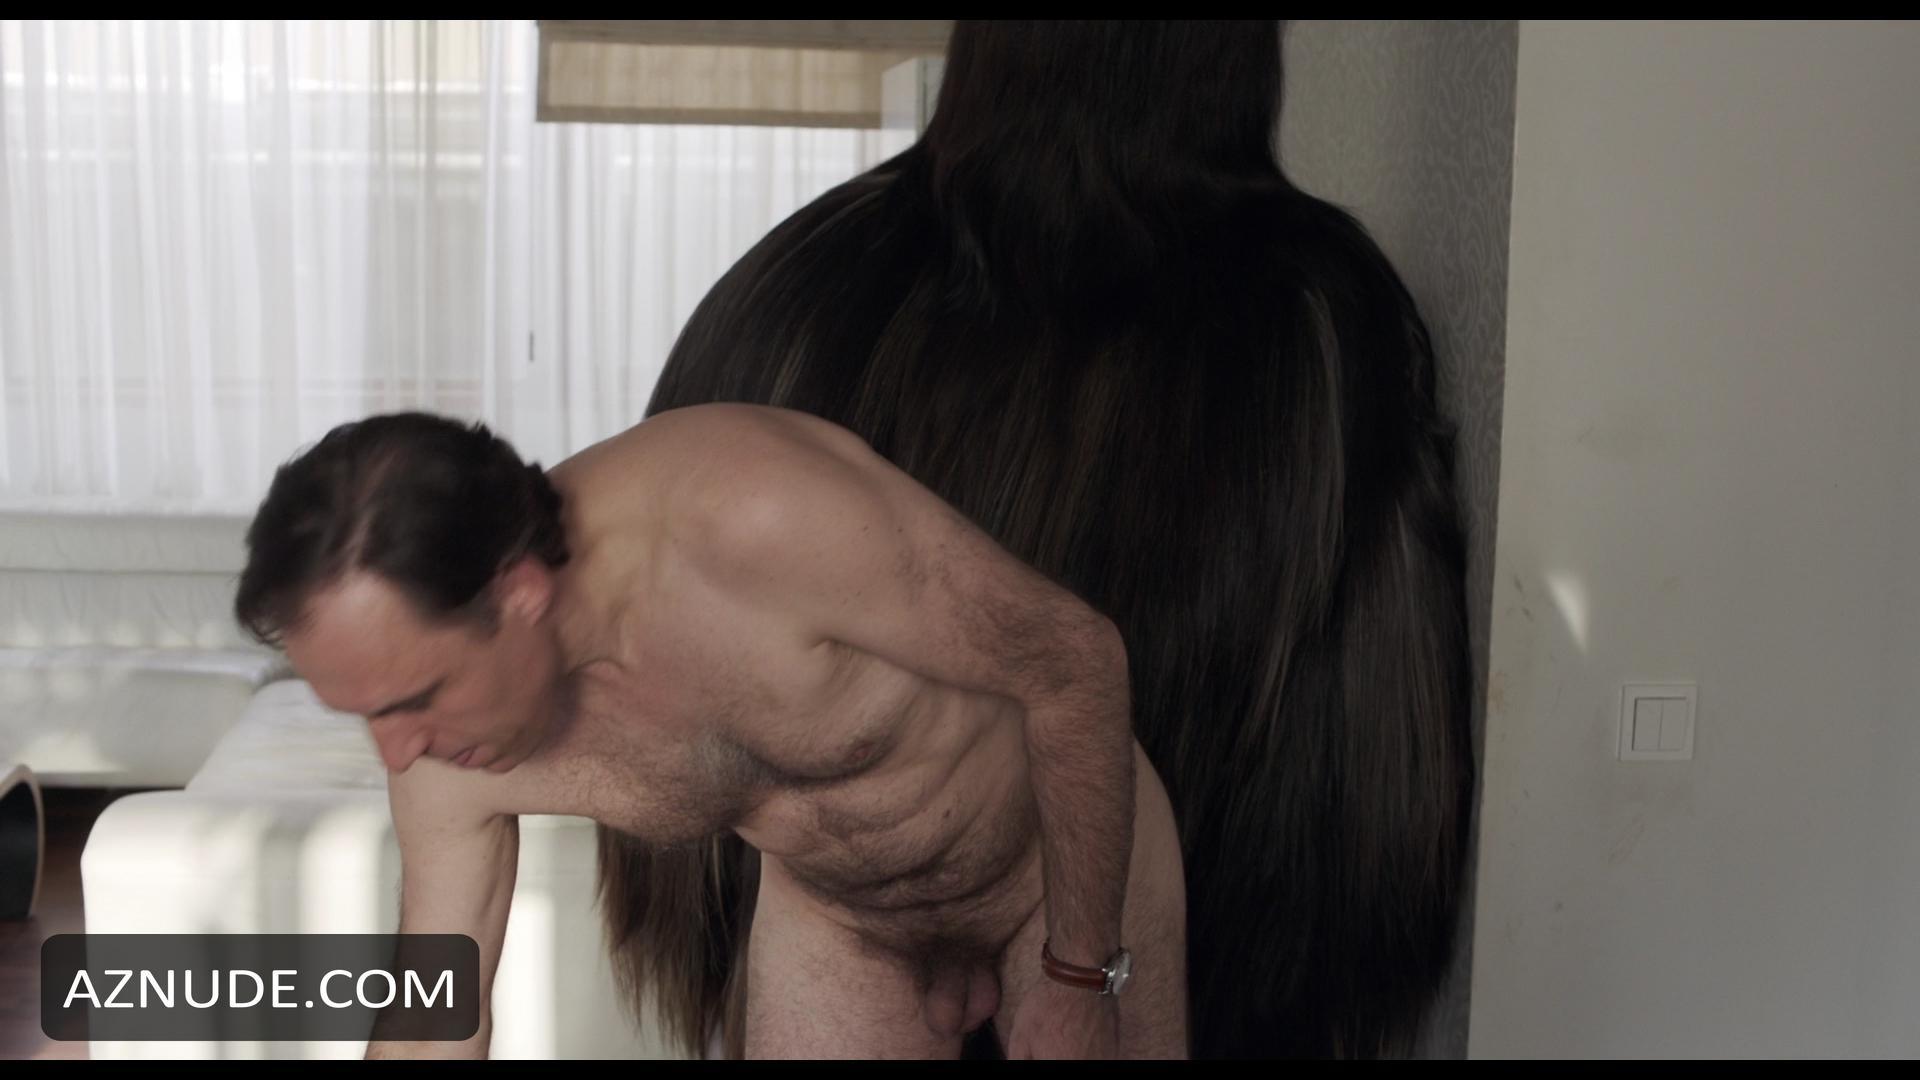 Toni erdmann naked